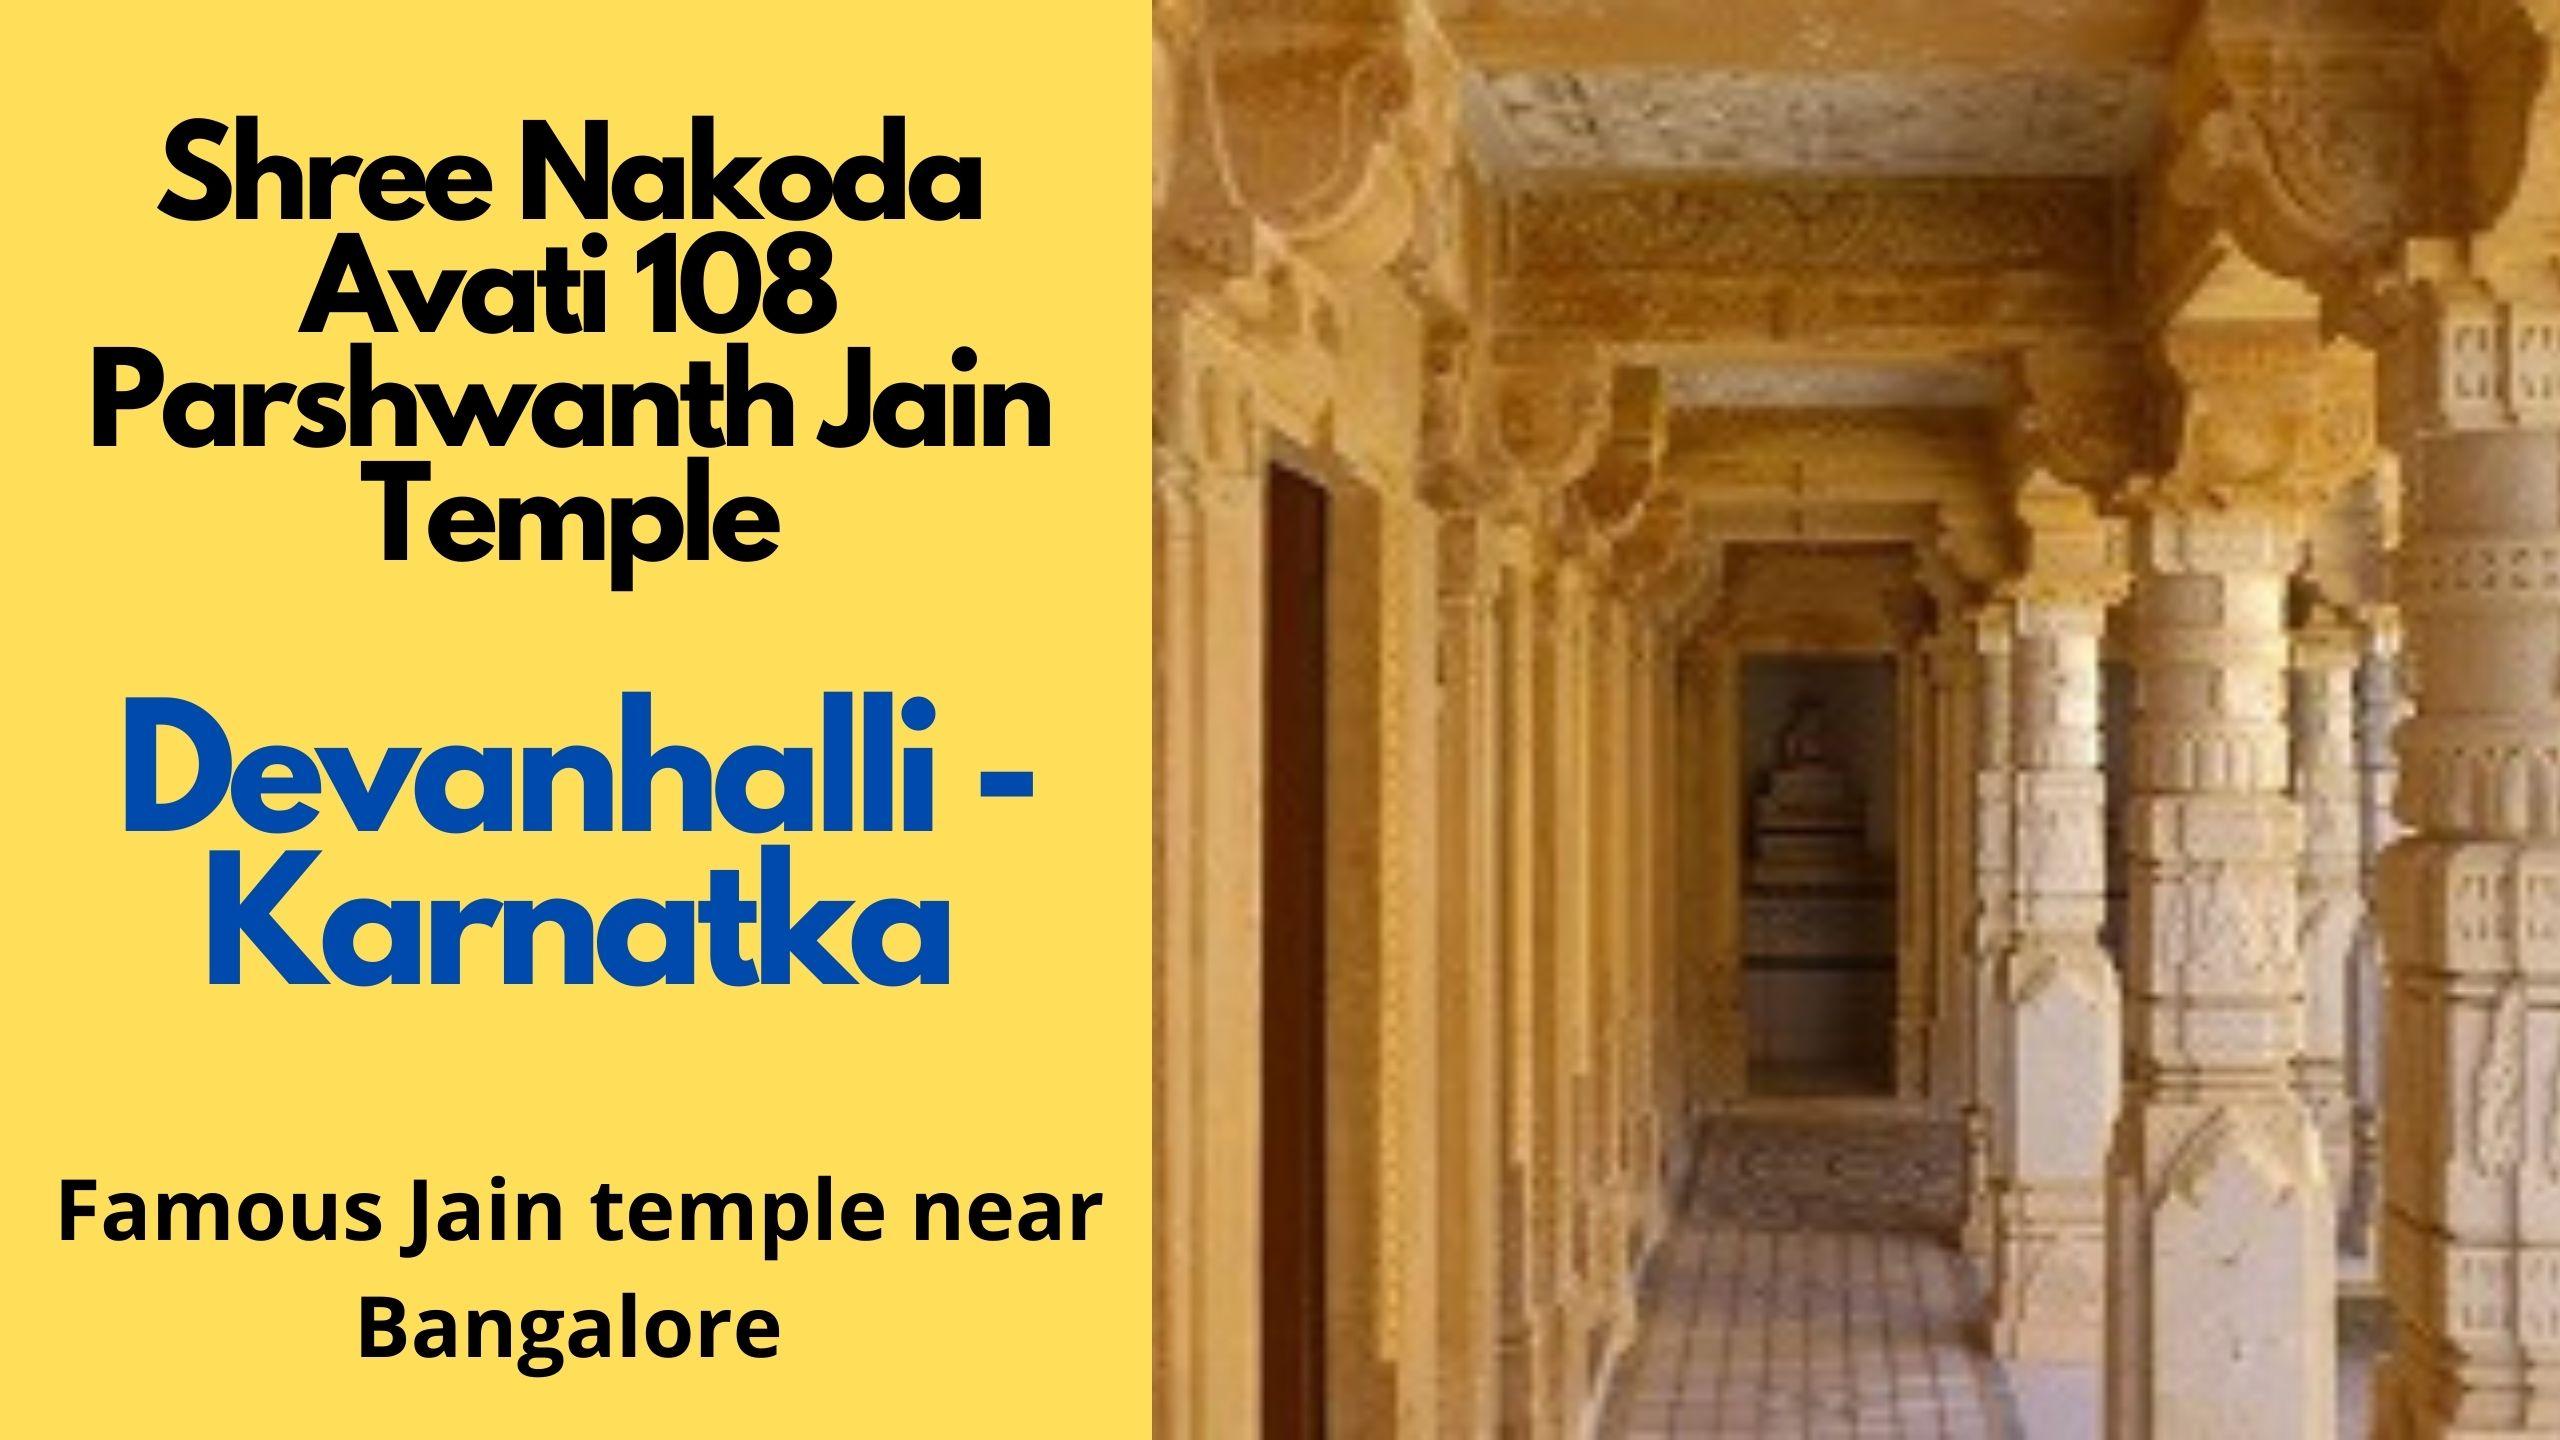 Jain temple near bangalore